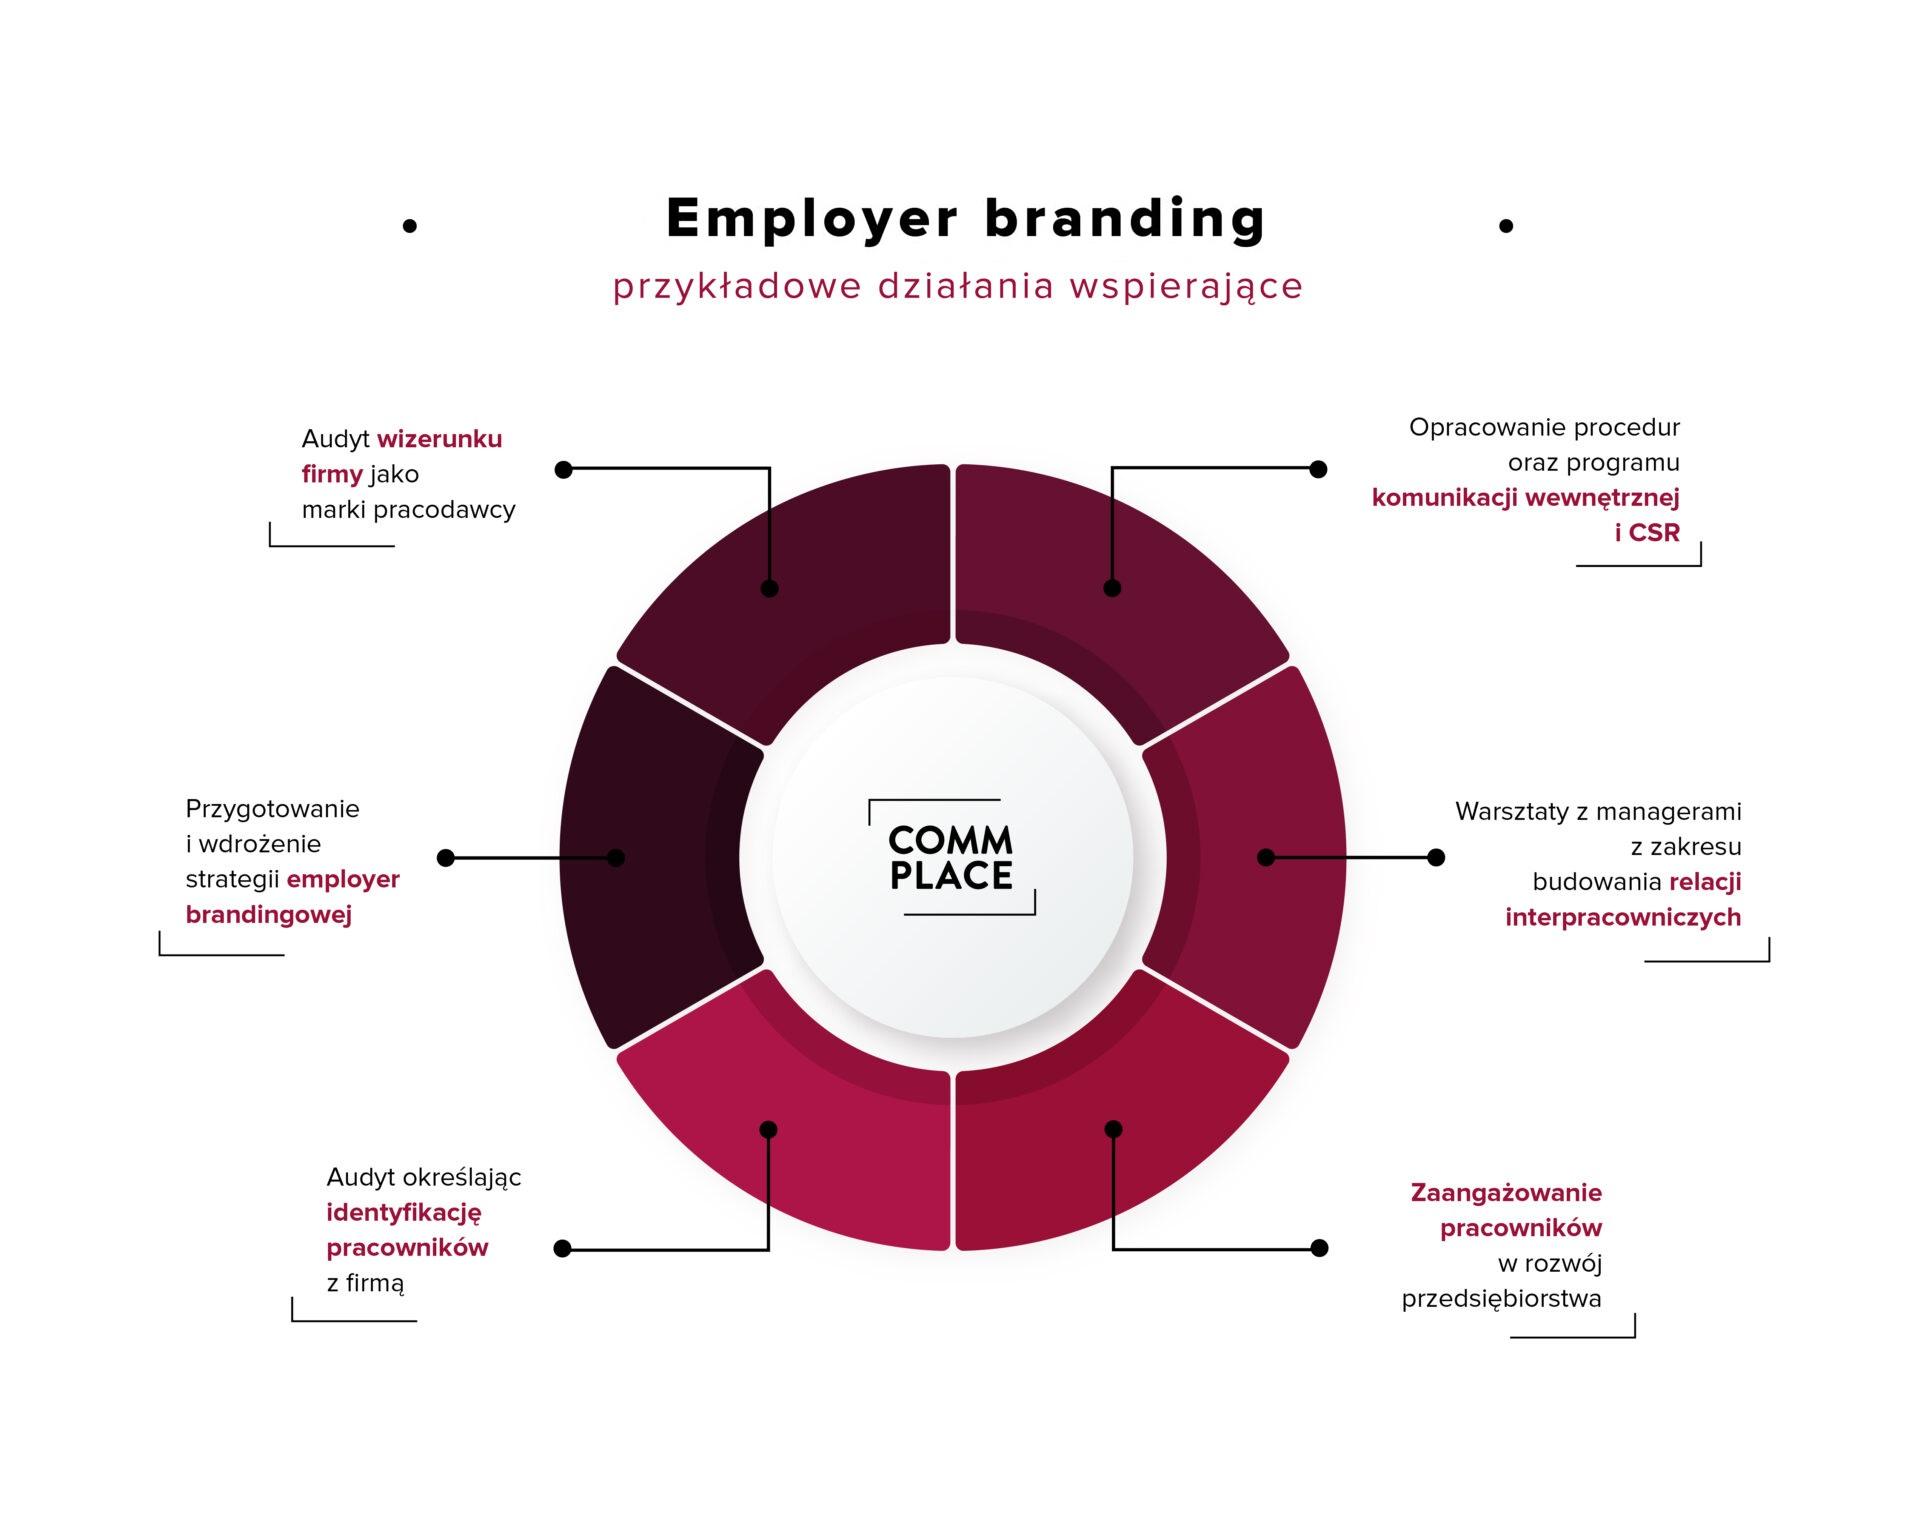 Materialy prasowe Commplace employer branding